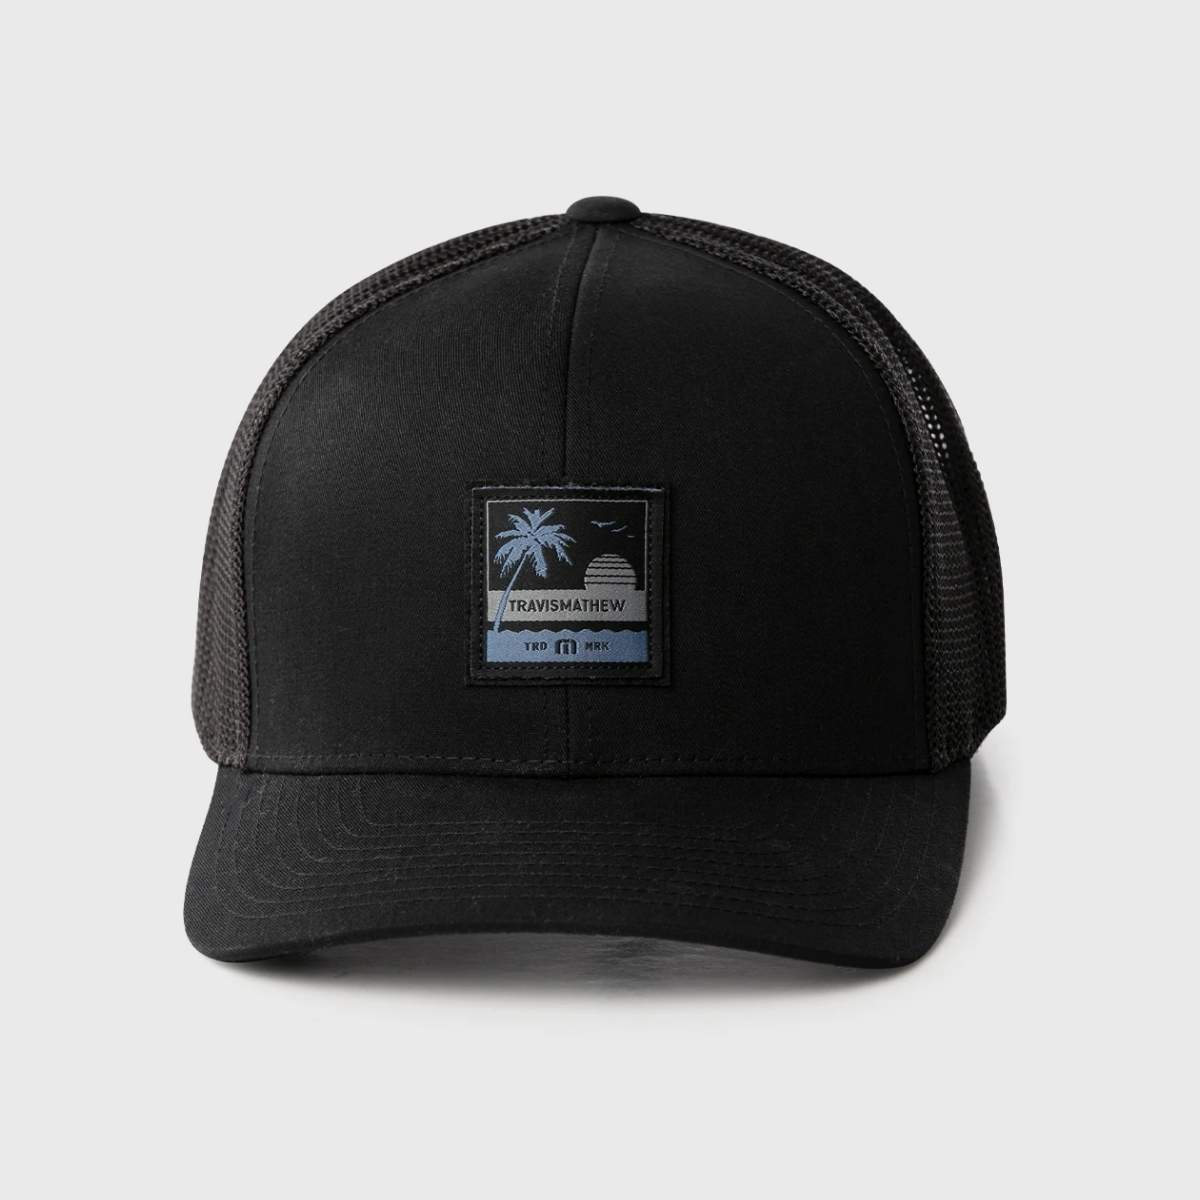 TravisMathew 2021 Help Yourself Adjustable Hat